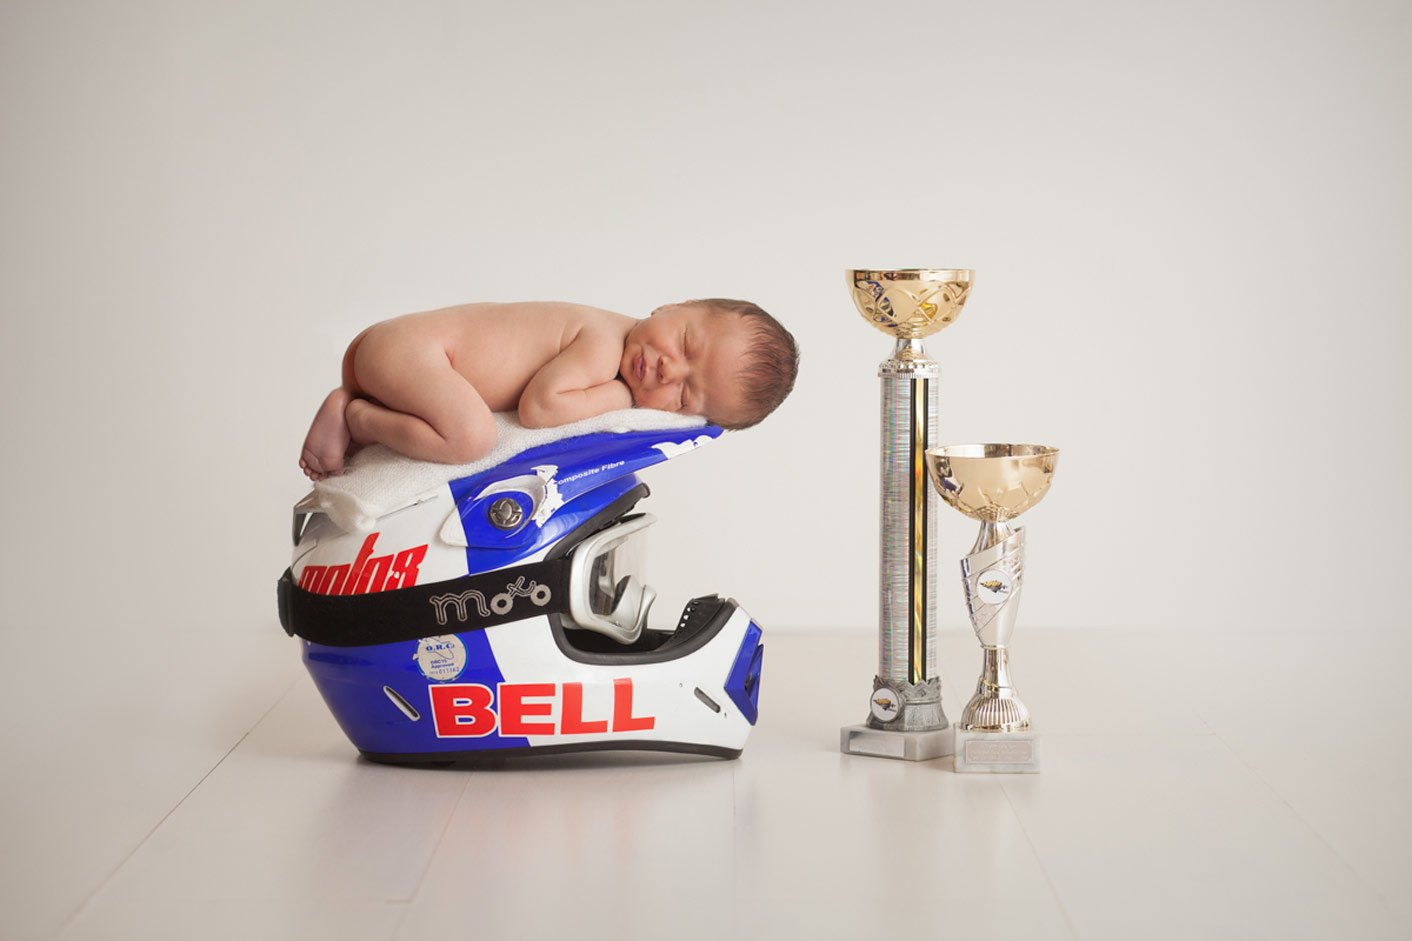 Newborn baby on the racing helmet